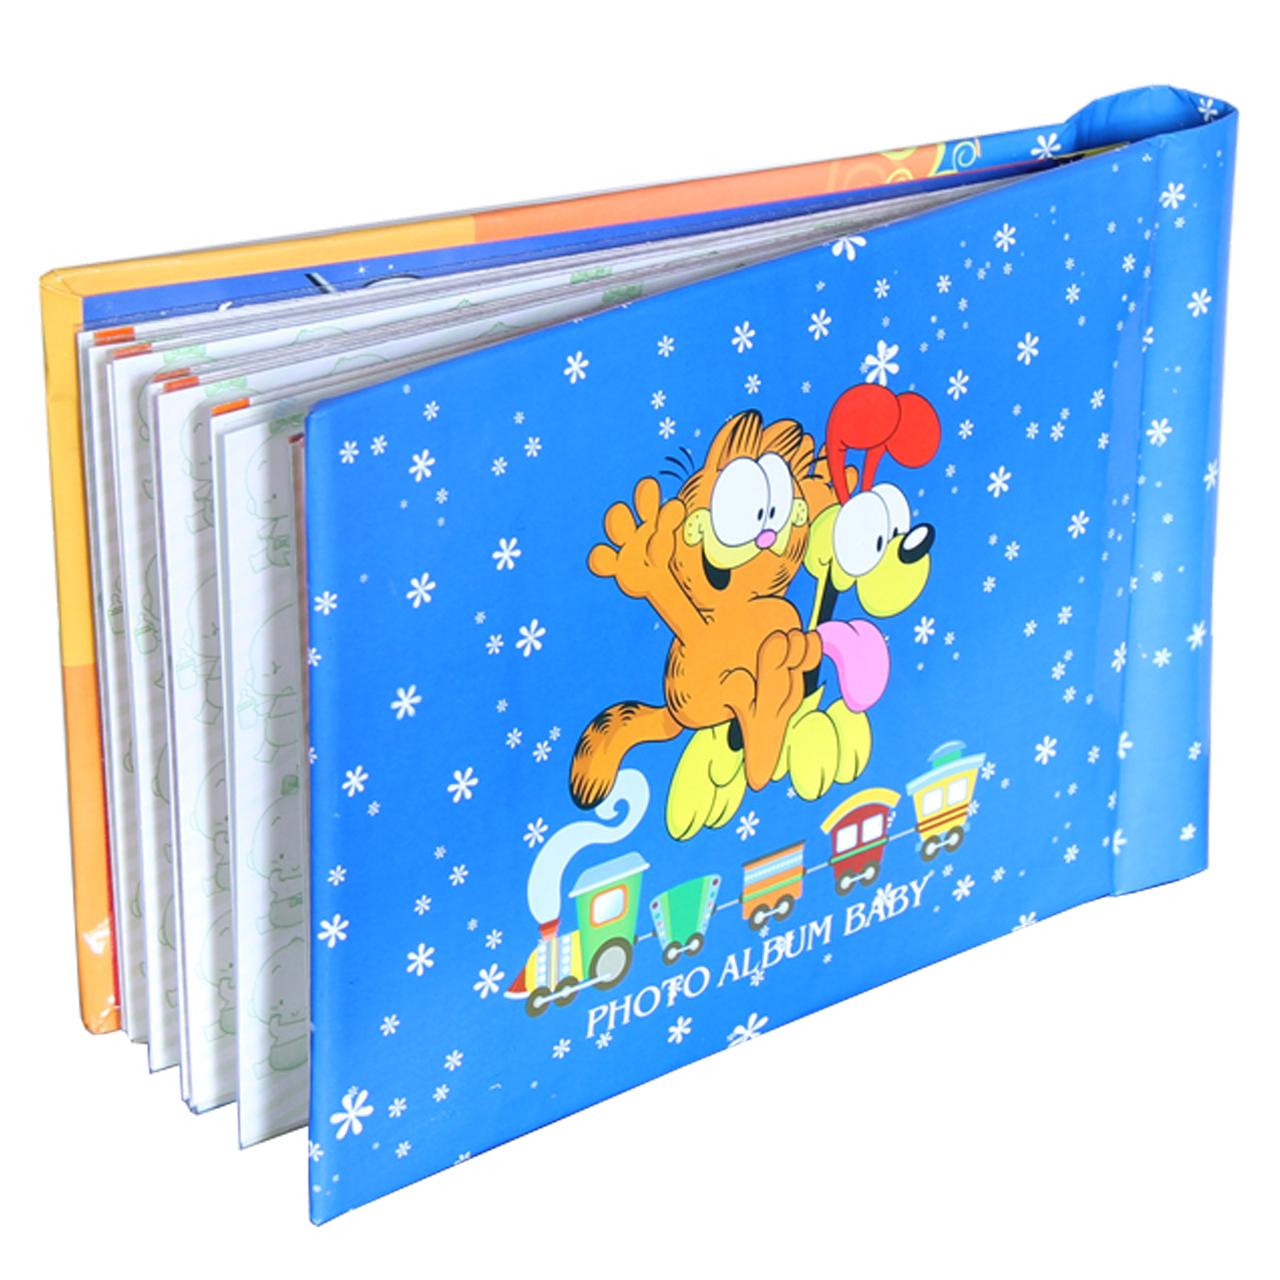 آلبوم خاطرات کودک نگین کد ۱۰۲۶